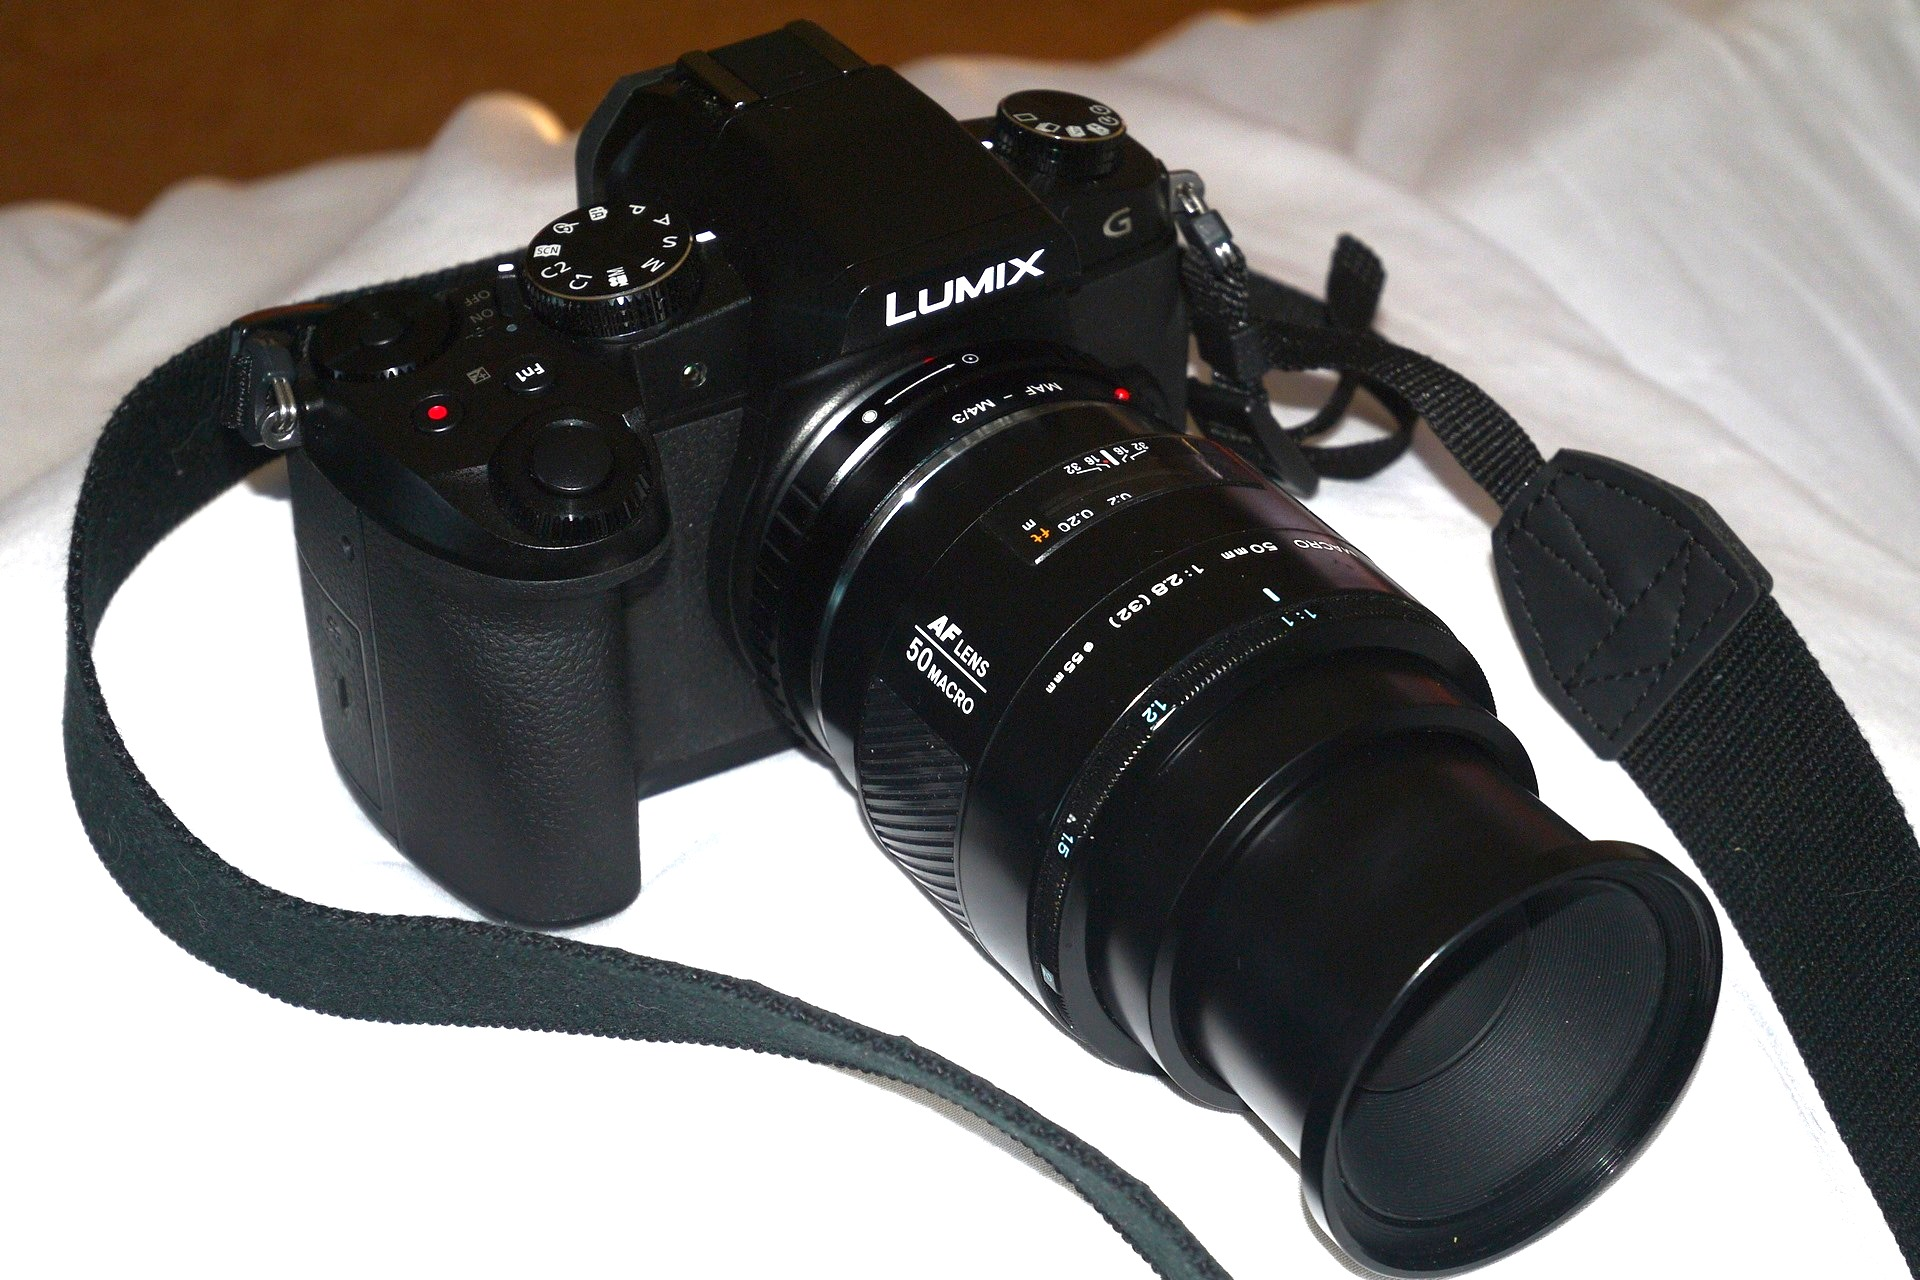 Minolta AF 50mm f2.8 macro